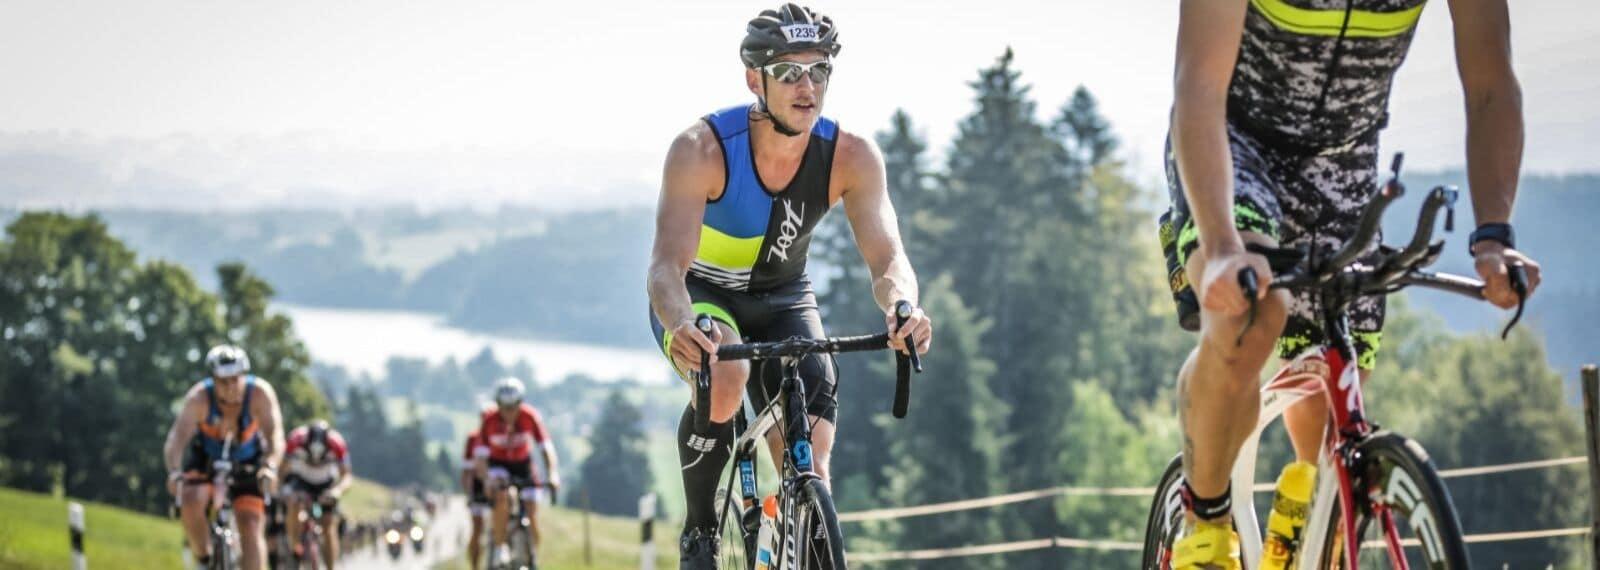 Tilmann auf dem Fahrrad beim Allgäu-Triathlon